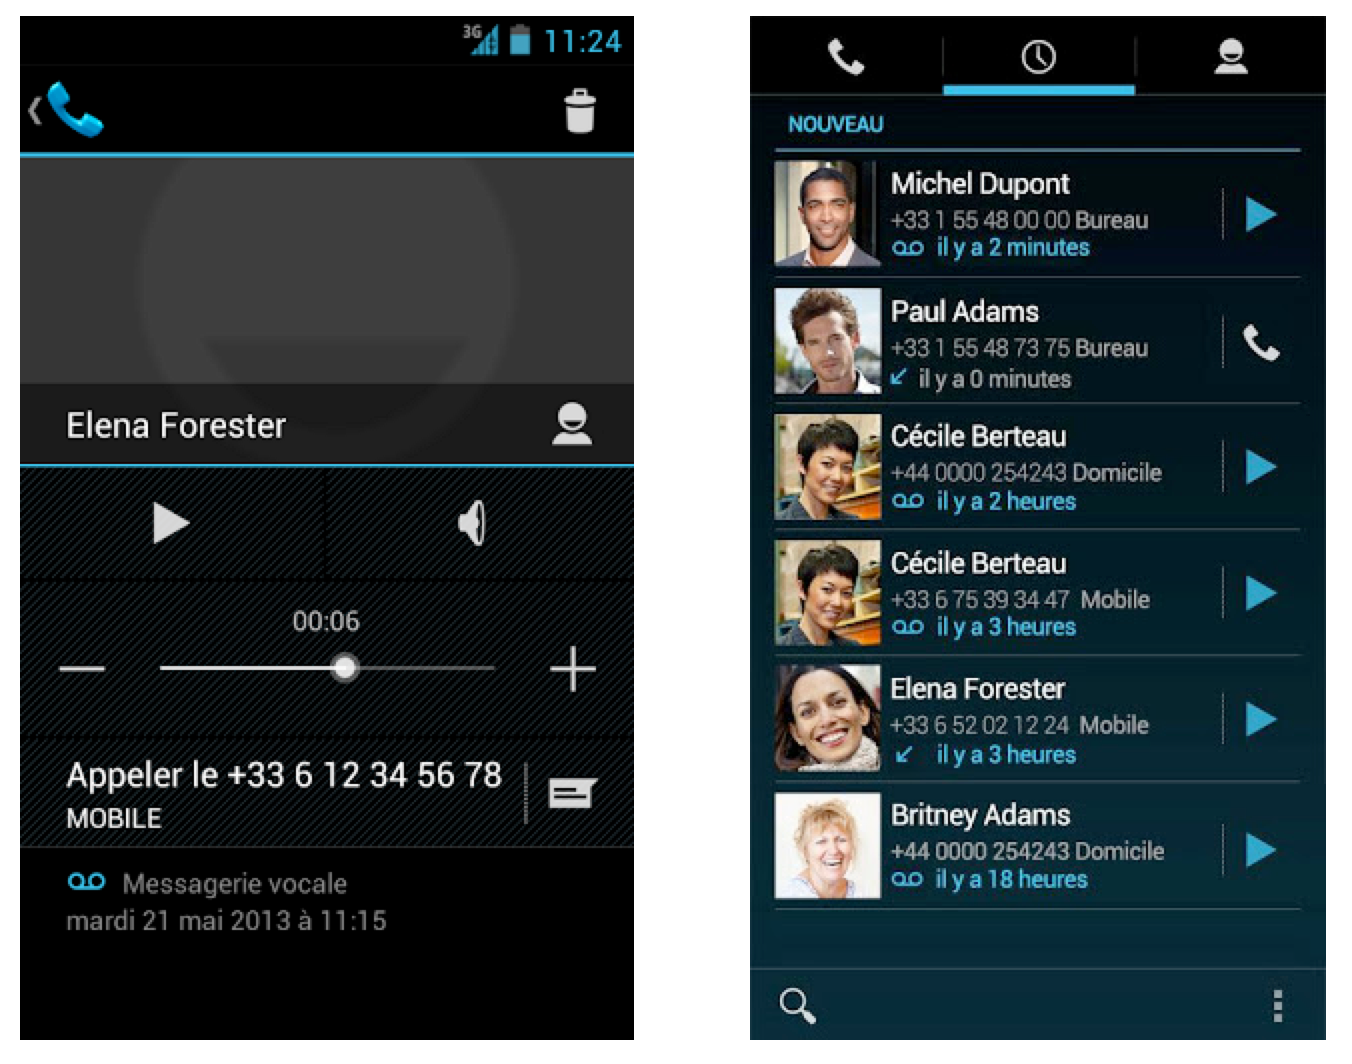 orange la messagerie vocale visuelle int gr e nativement sur android 4 2 frandroid. Black Bedroom Furniture Sets. Home Design Ideas